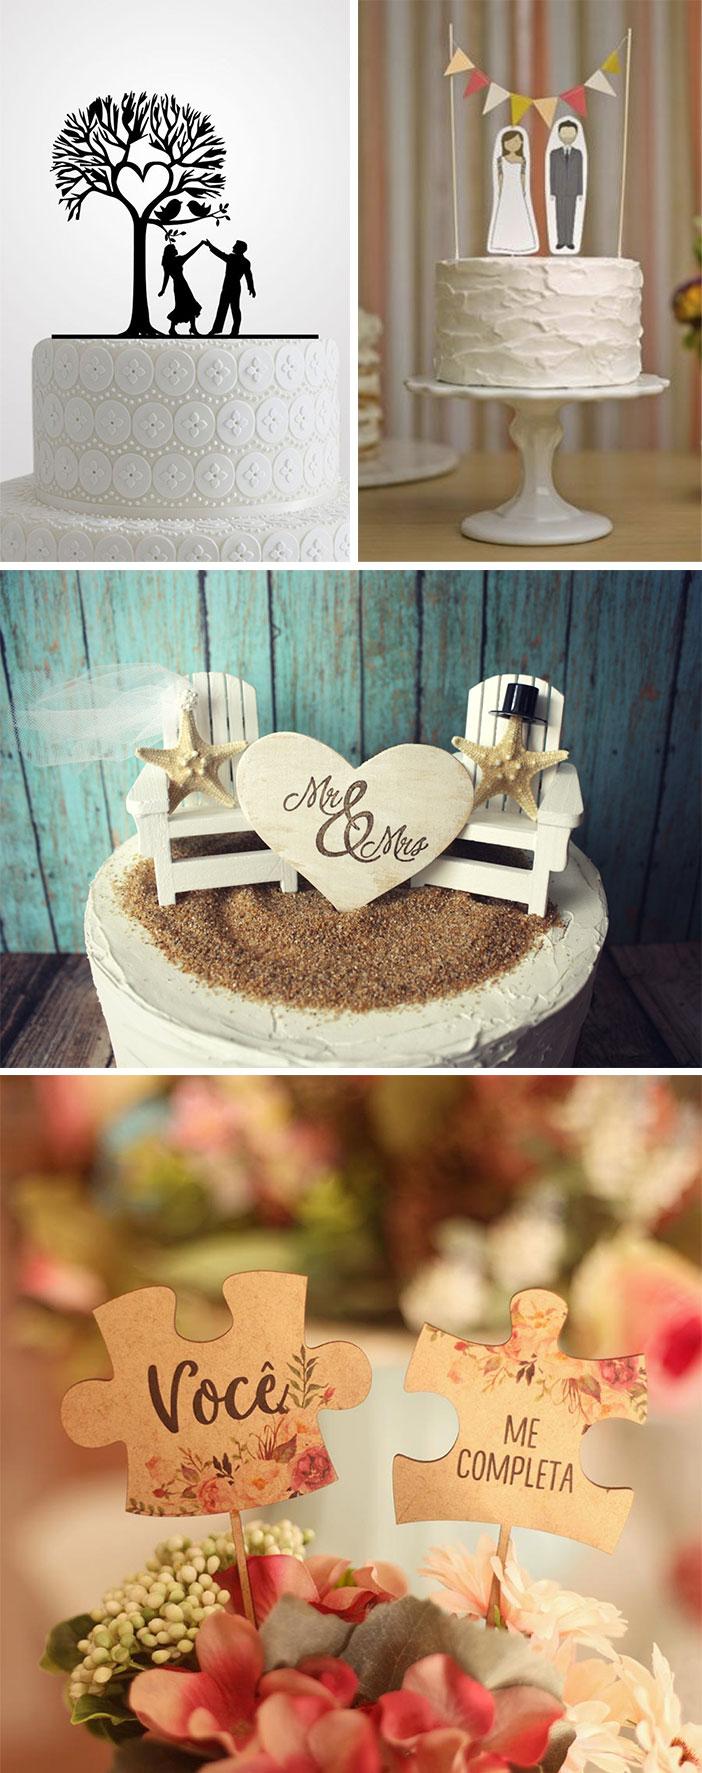 Casamento: topos de bolo criativos